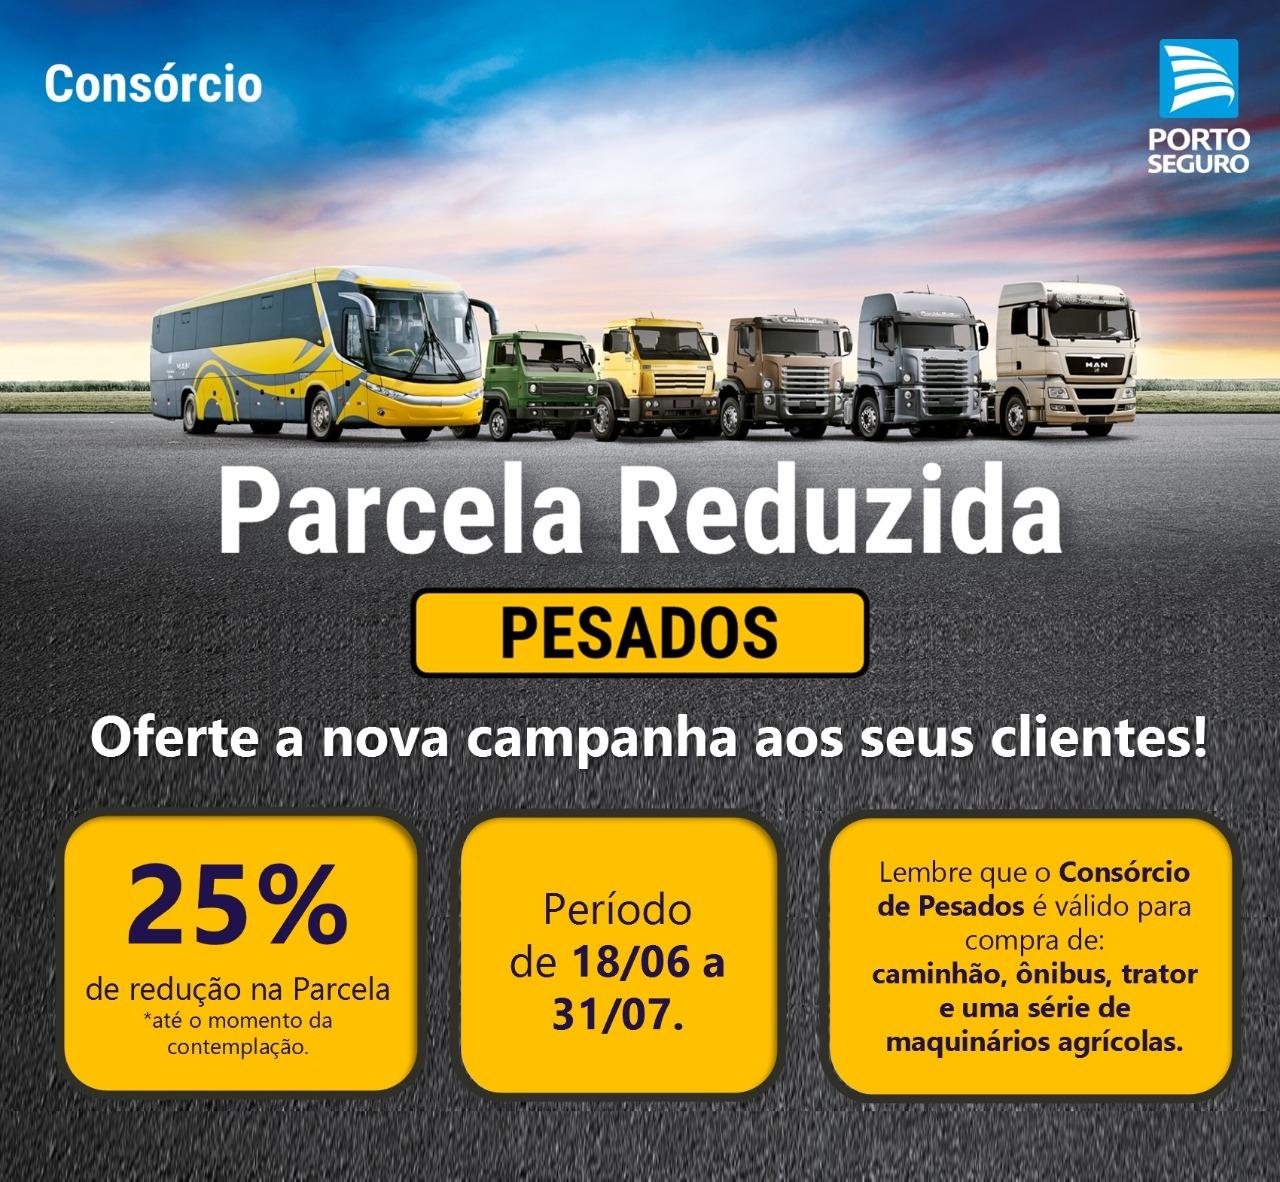 Venda de CRÉDITO P/ INVESTIMENTOS